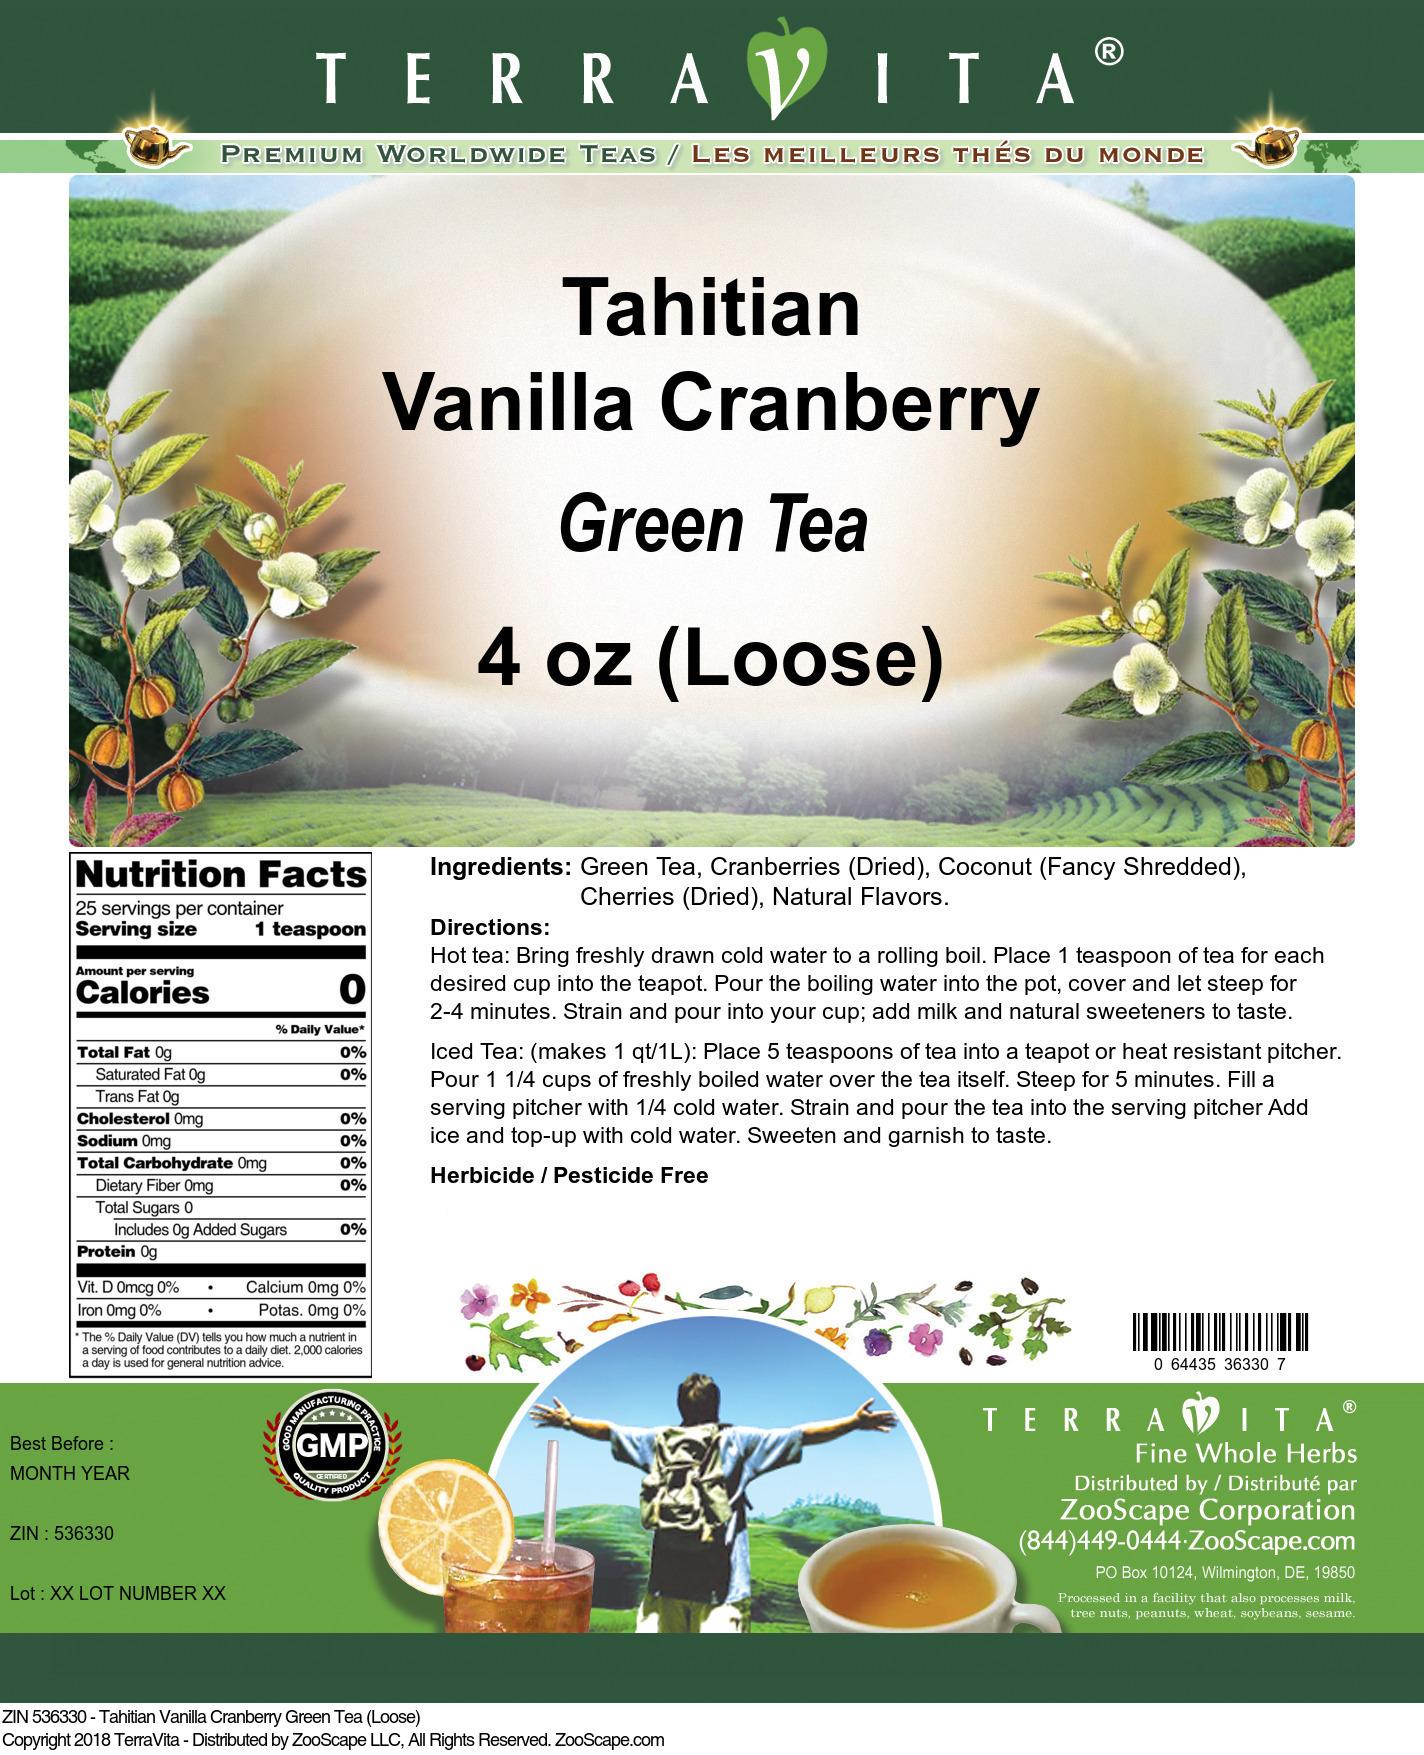 Tahitian Vanilla Cranberry Green Tea (Loose)